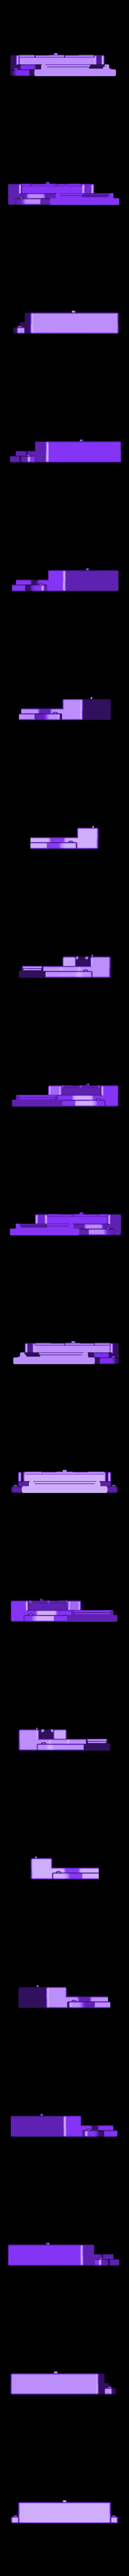 main_screen_2.stl Download free STL file ORCA communicator (Godzilla) • 3D printing object, poblocki1982